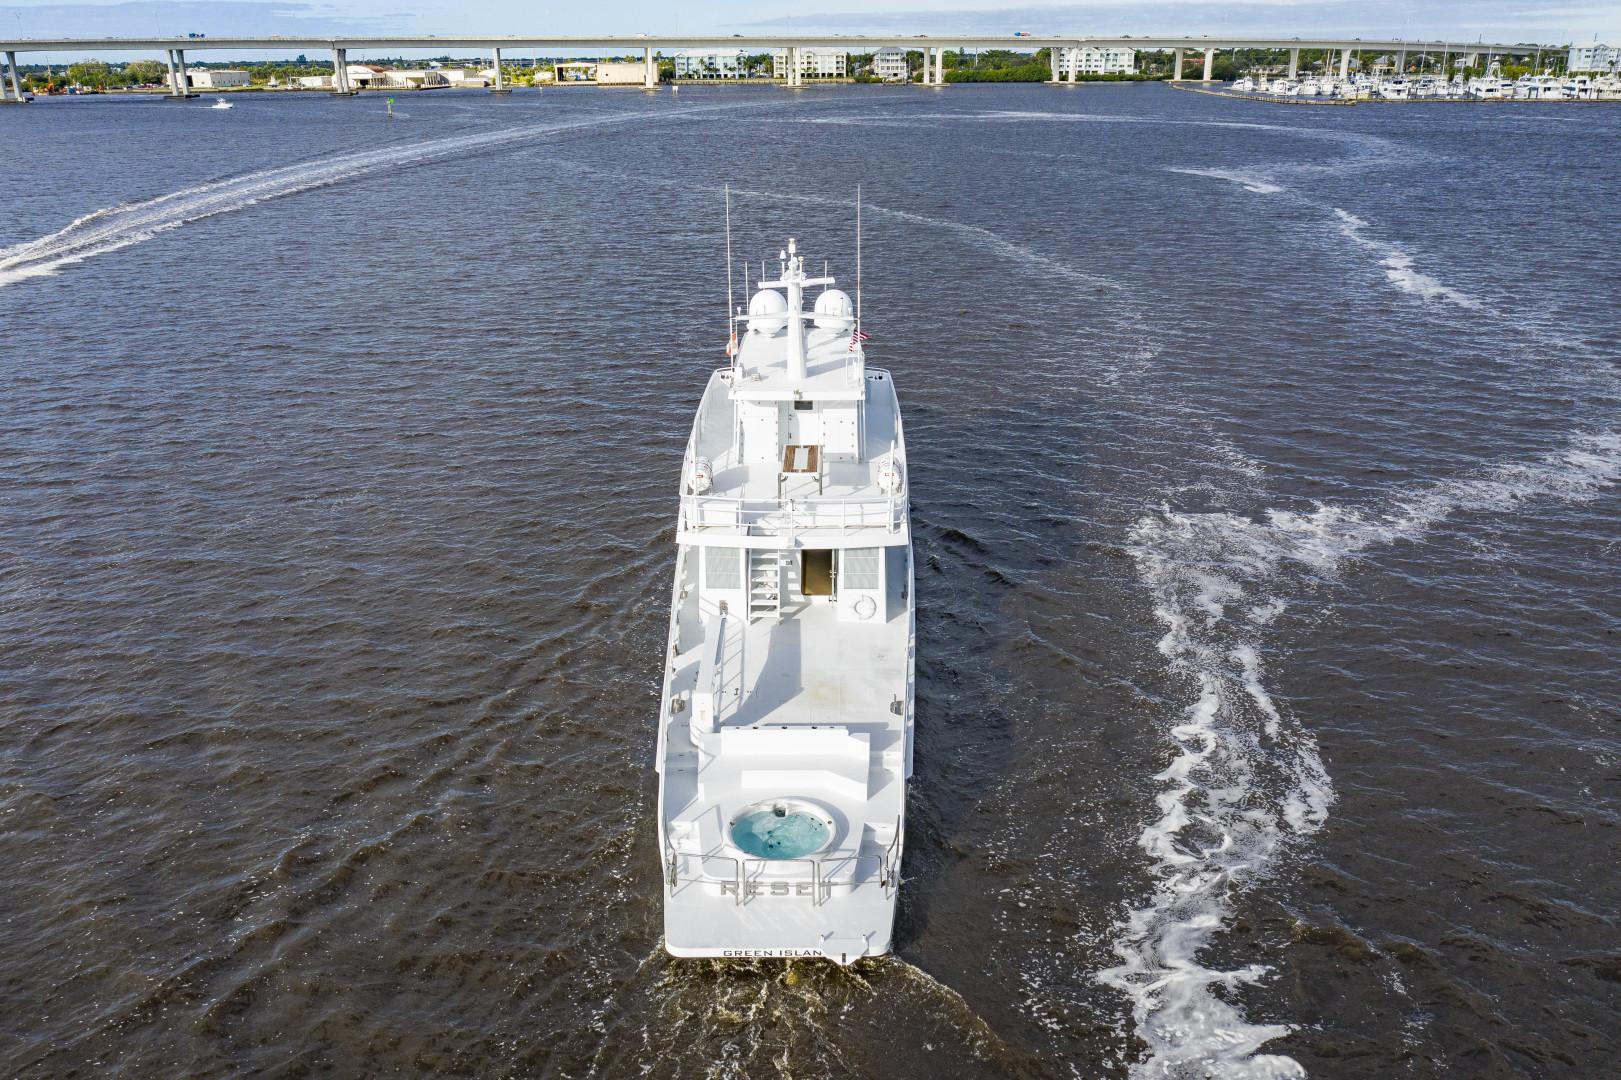 GlassTech-Expedition Yacht 2018-Reset Stuart-Florida-United States-Profile-1568527 | Thumbnail